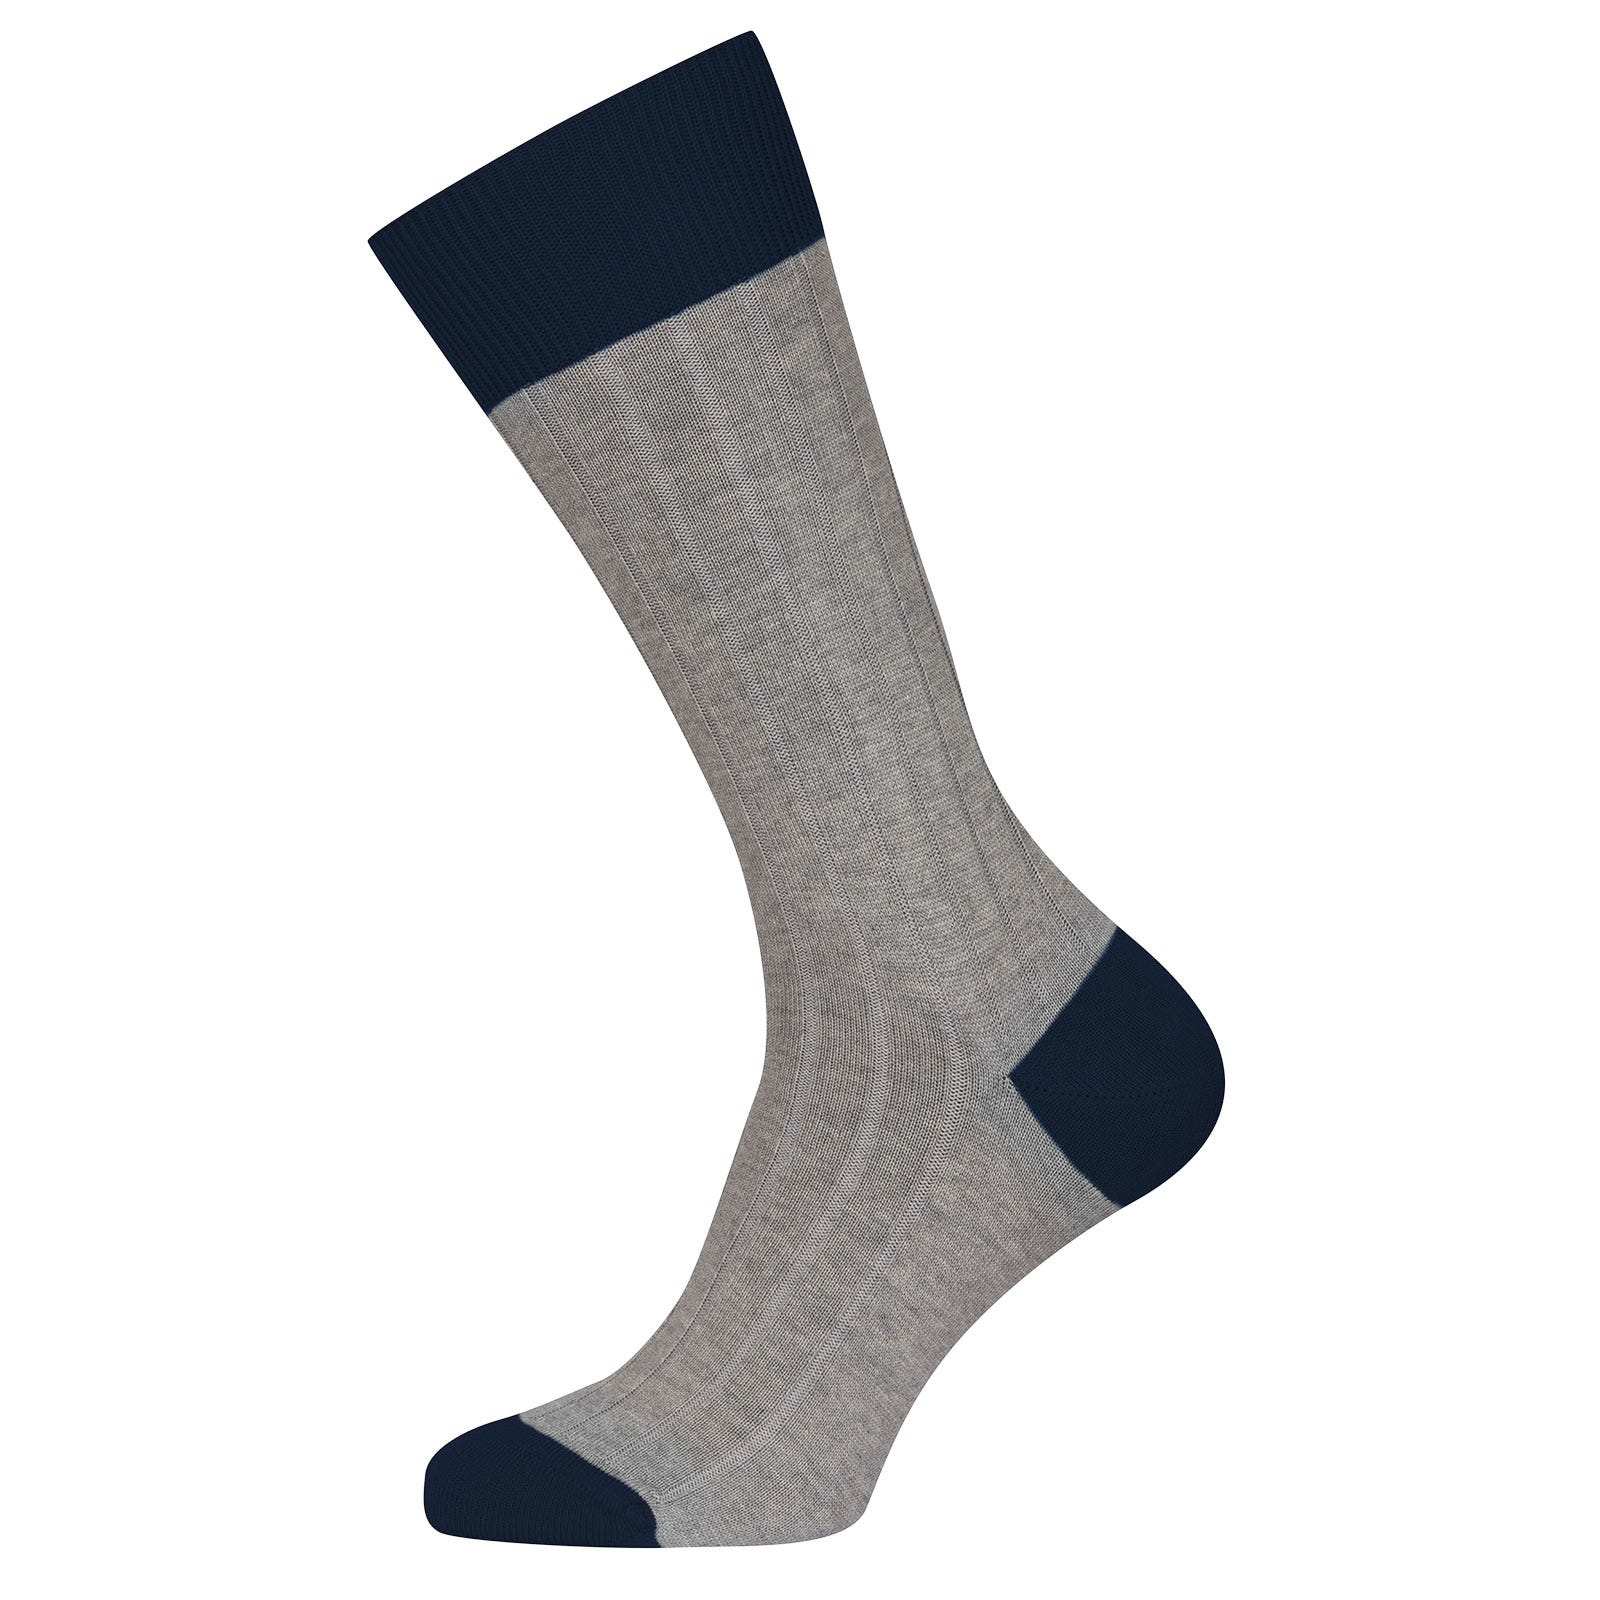 John Smedley Gamma in Silver Socks-M/L